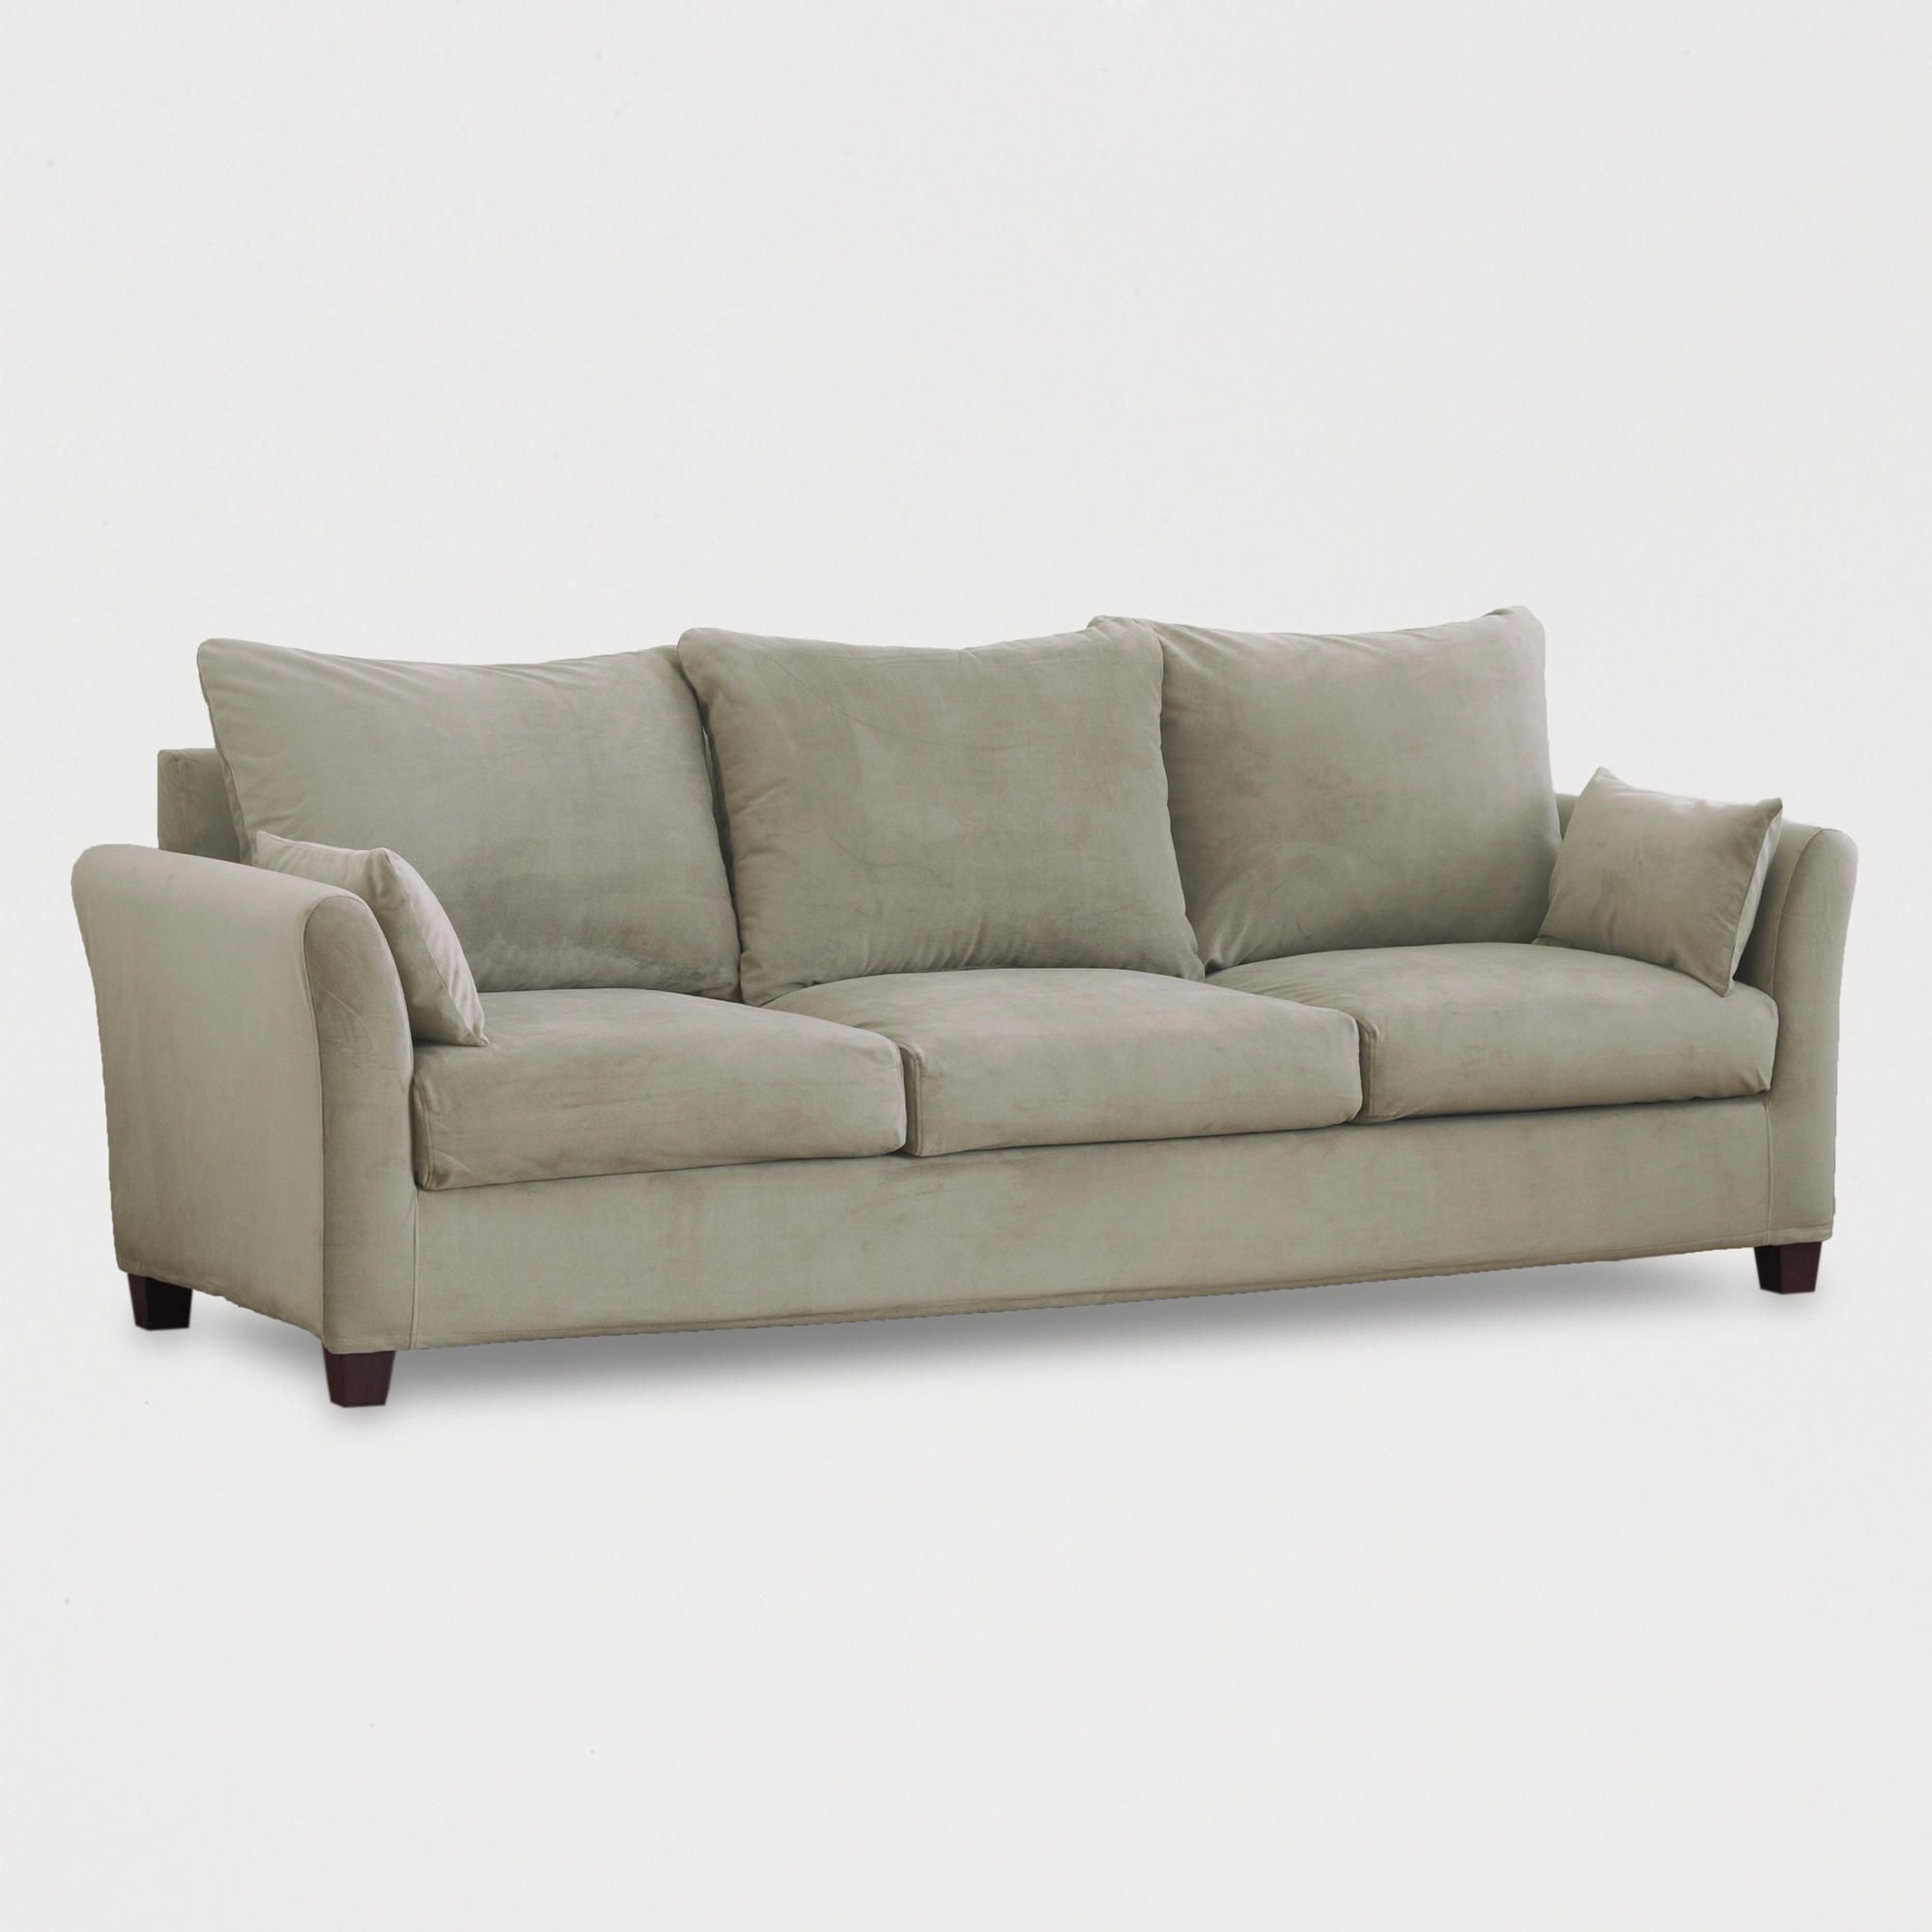 Grey Mink Luxe Three-Seat Sofa Velvet Slipcover Collection ...